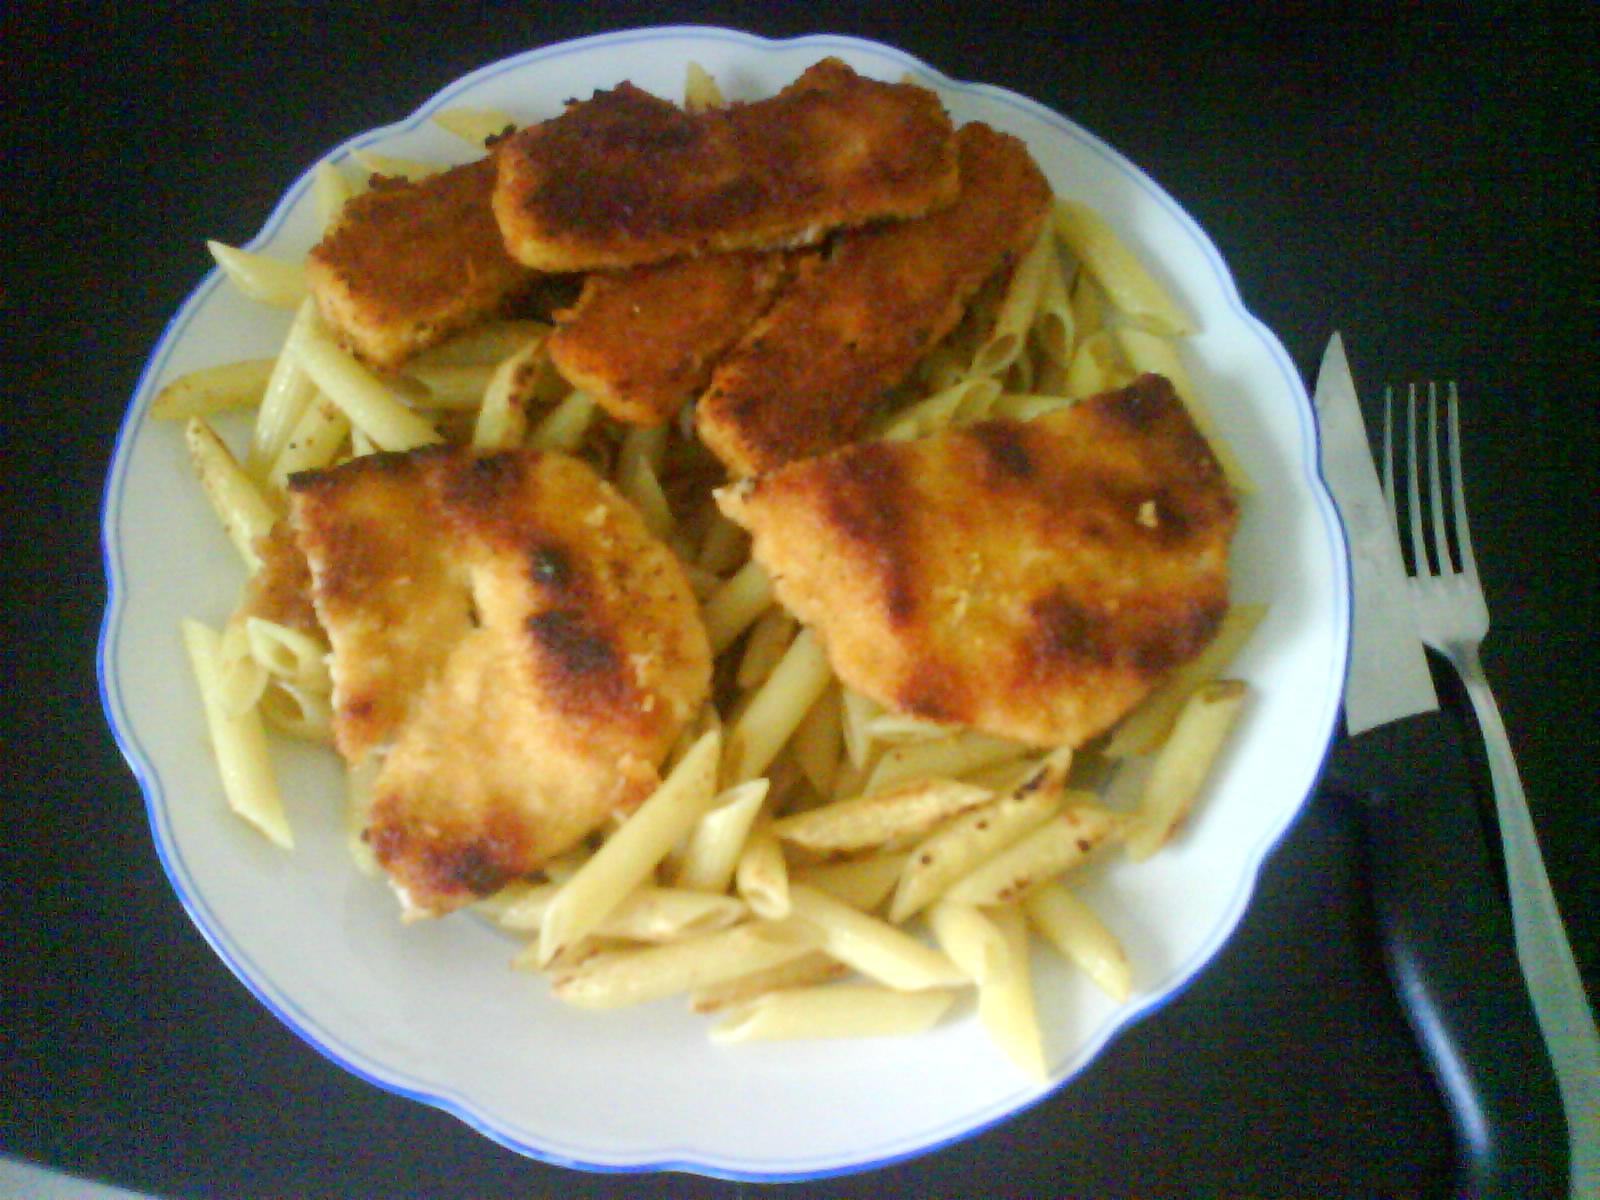 http://foodloader.net/youhardt_2008-06-08_Schnitzel_Fisch_Nudeln.jpg